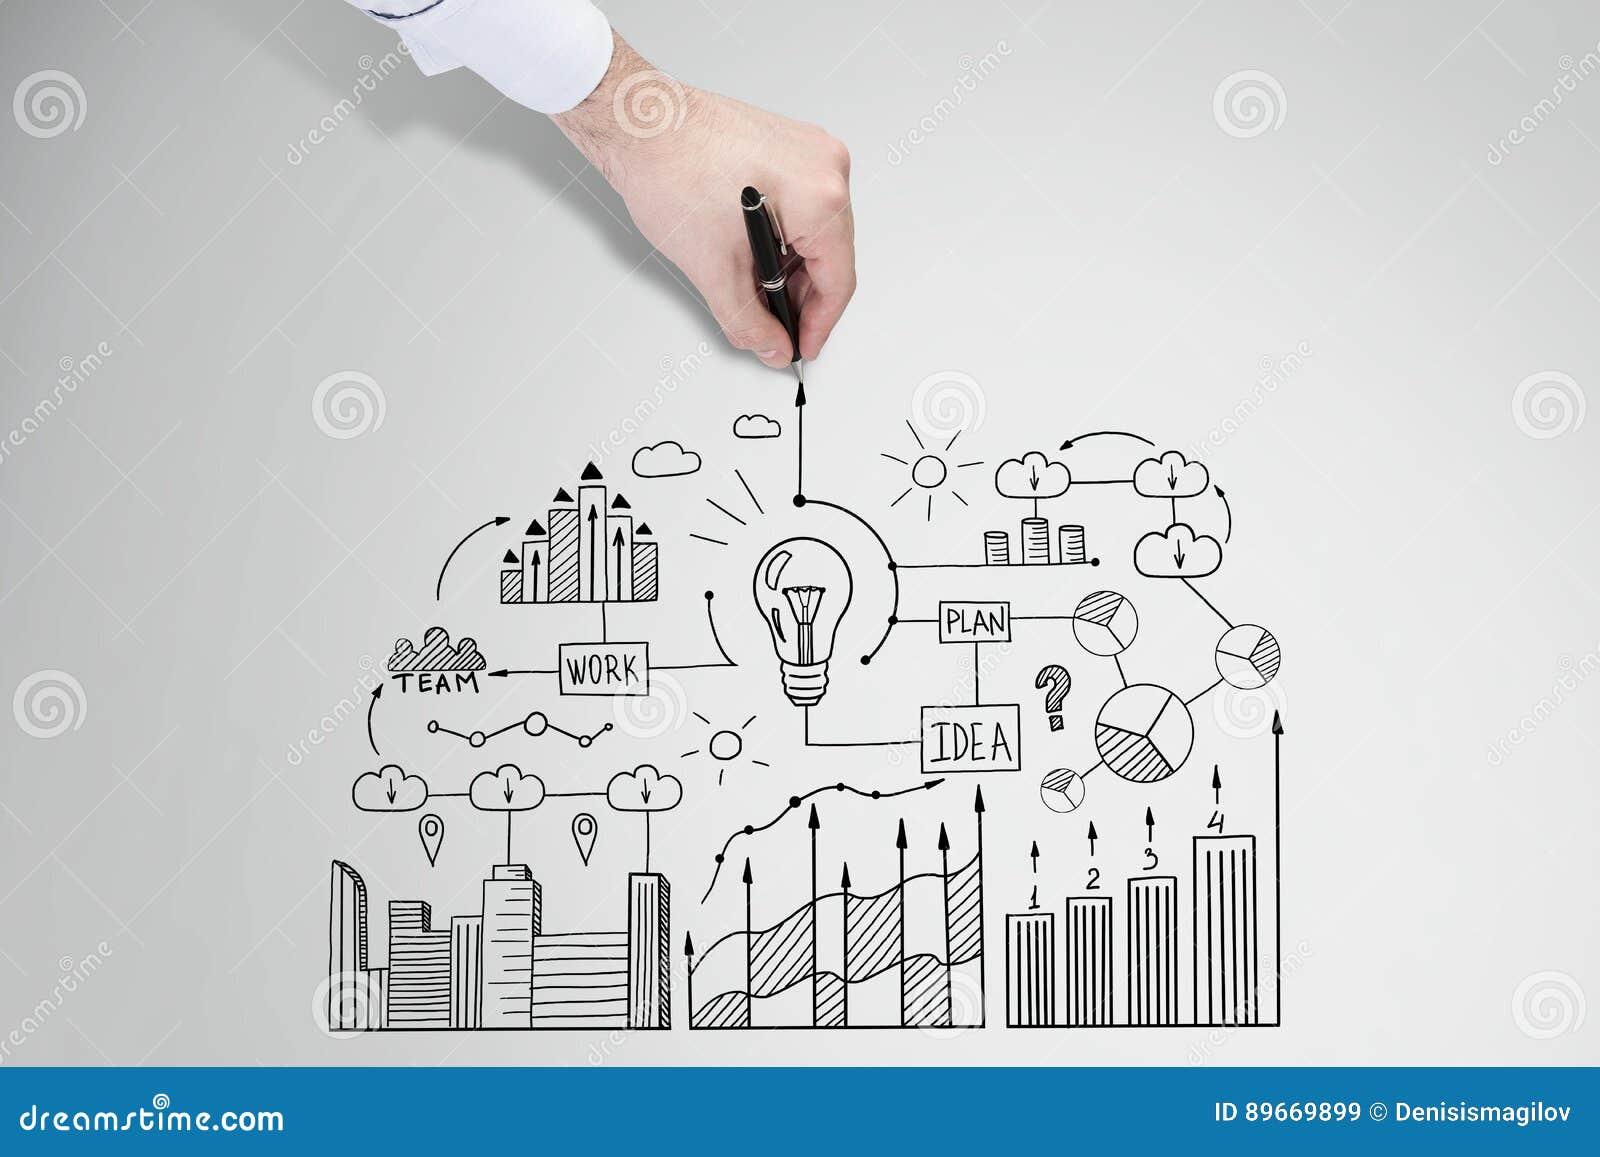 Man Hand Drawing Business Diagram Stock Illustration - Illustration ...